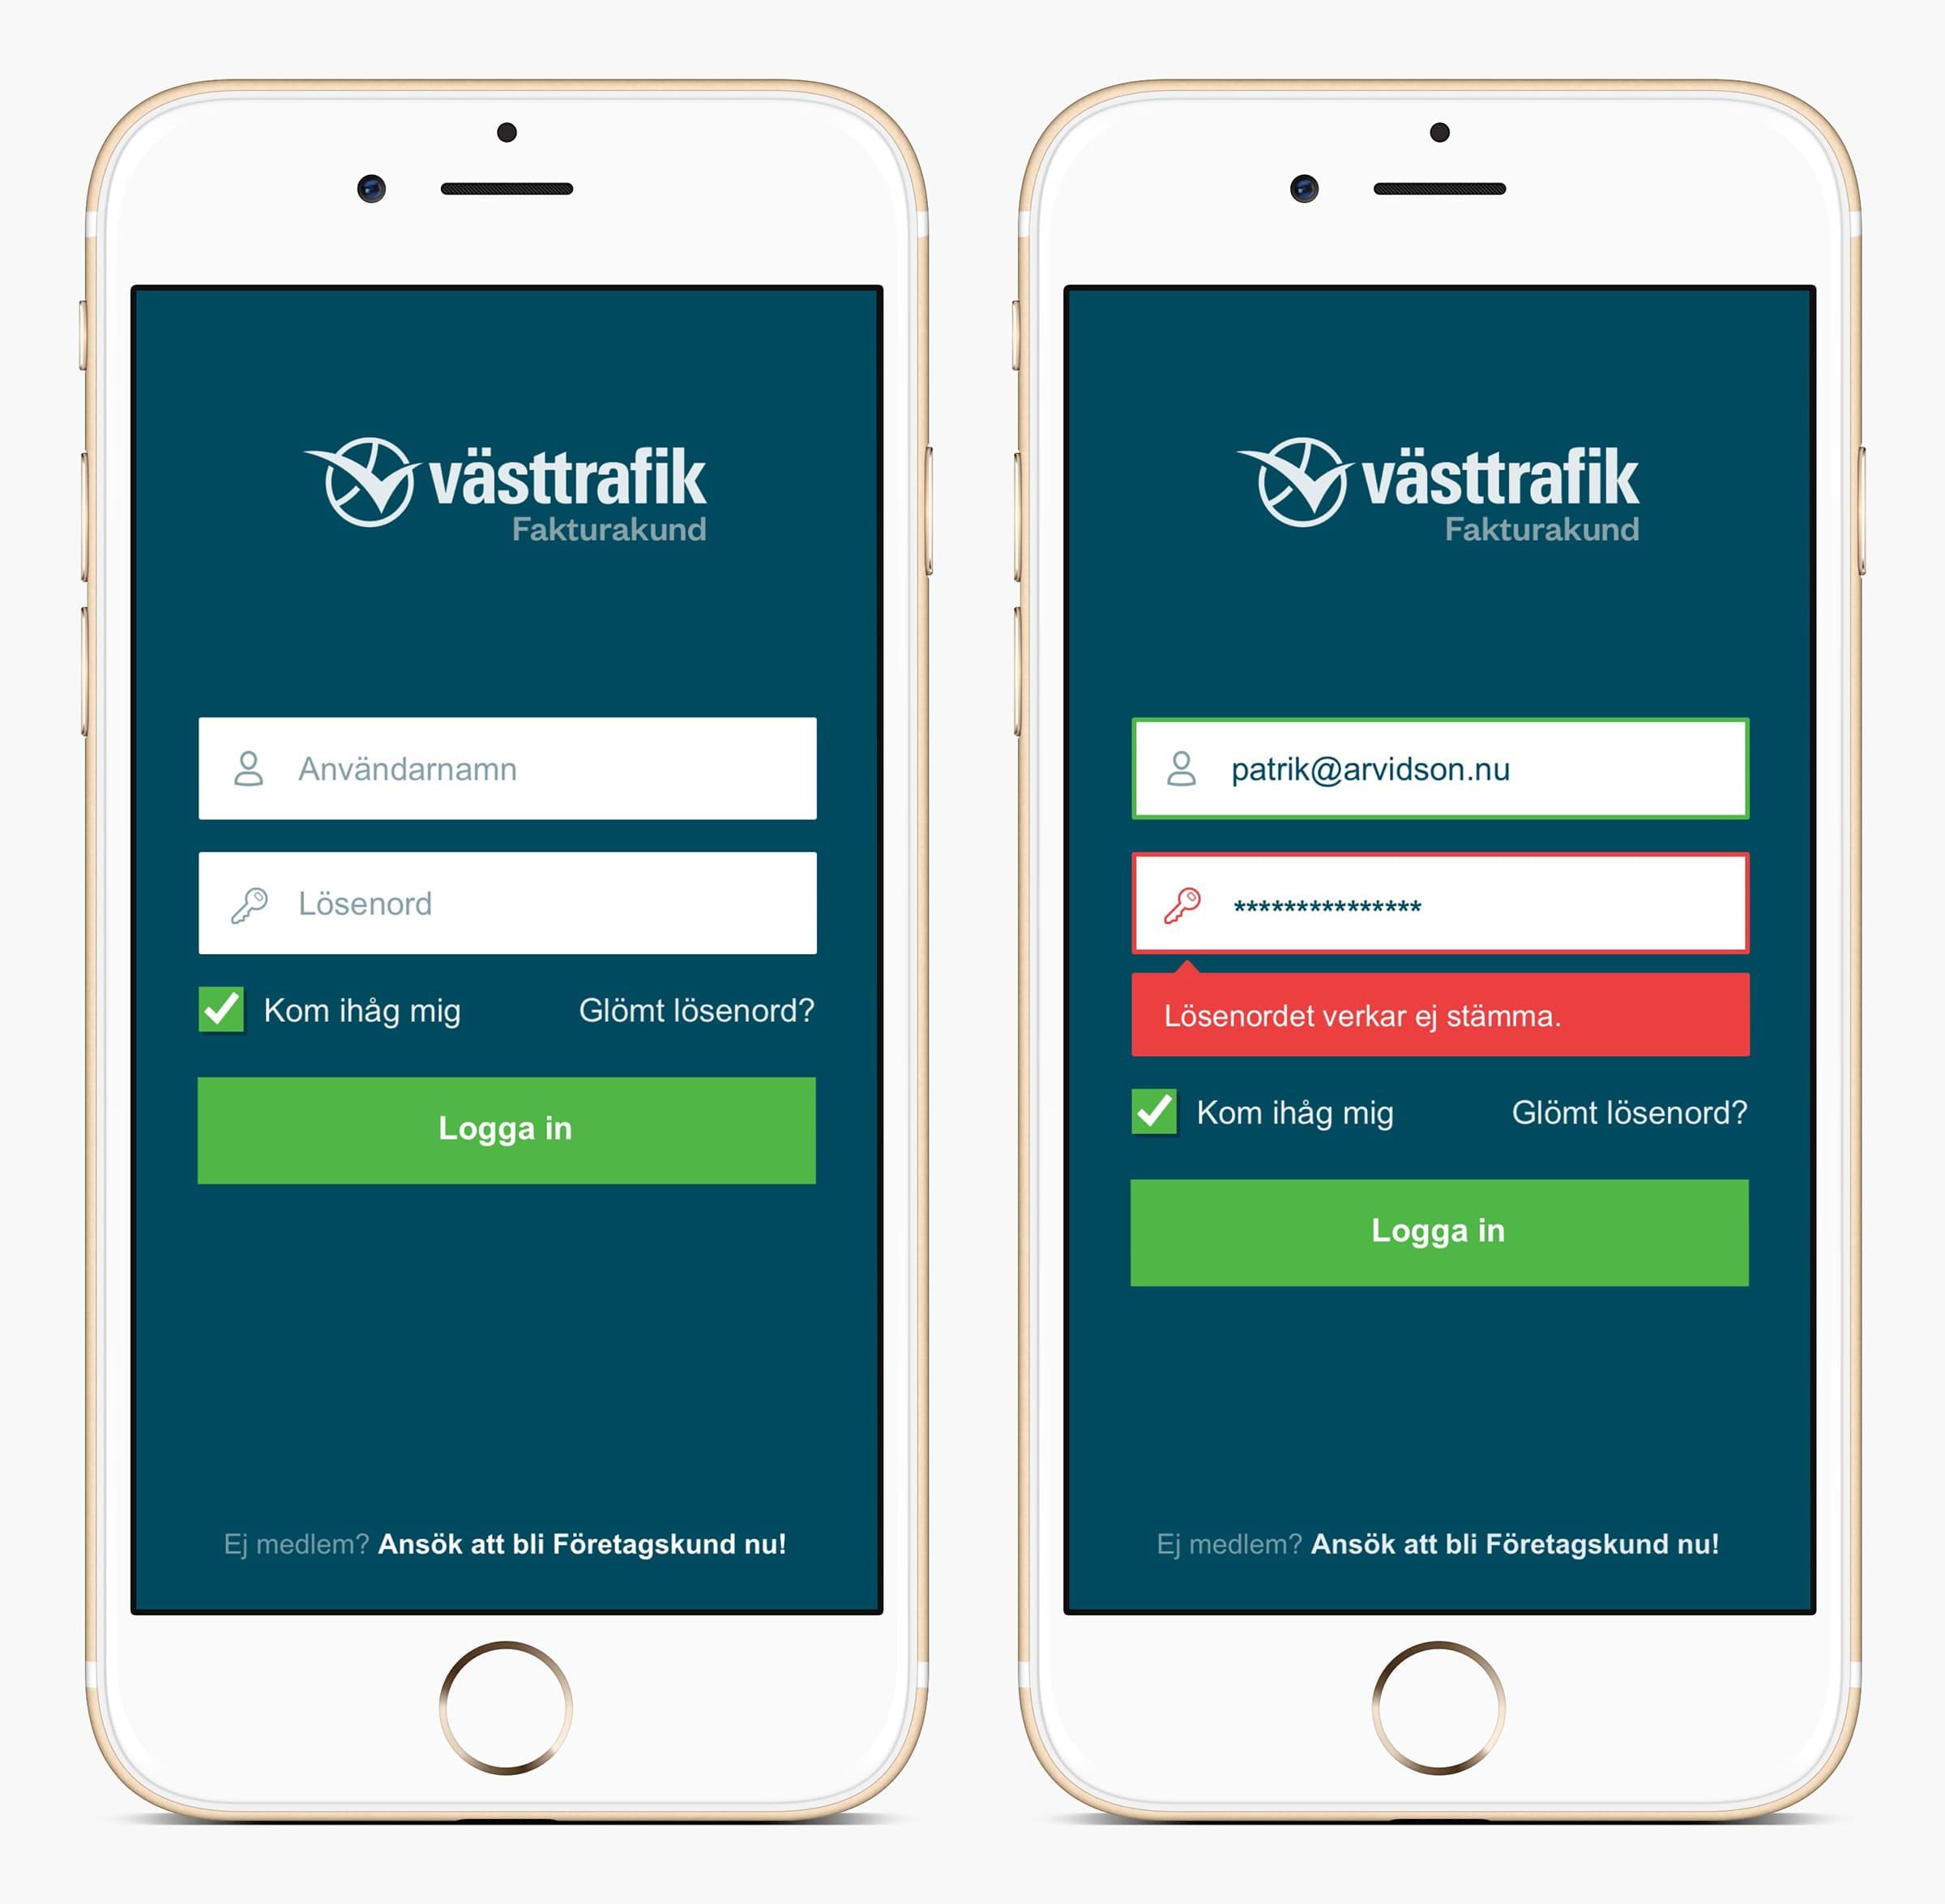 Västtrafik Portal mobile login